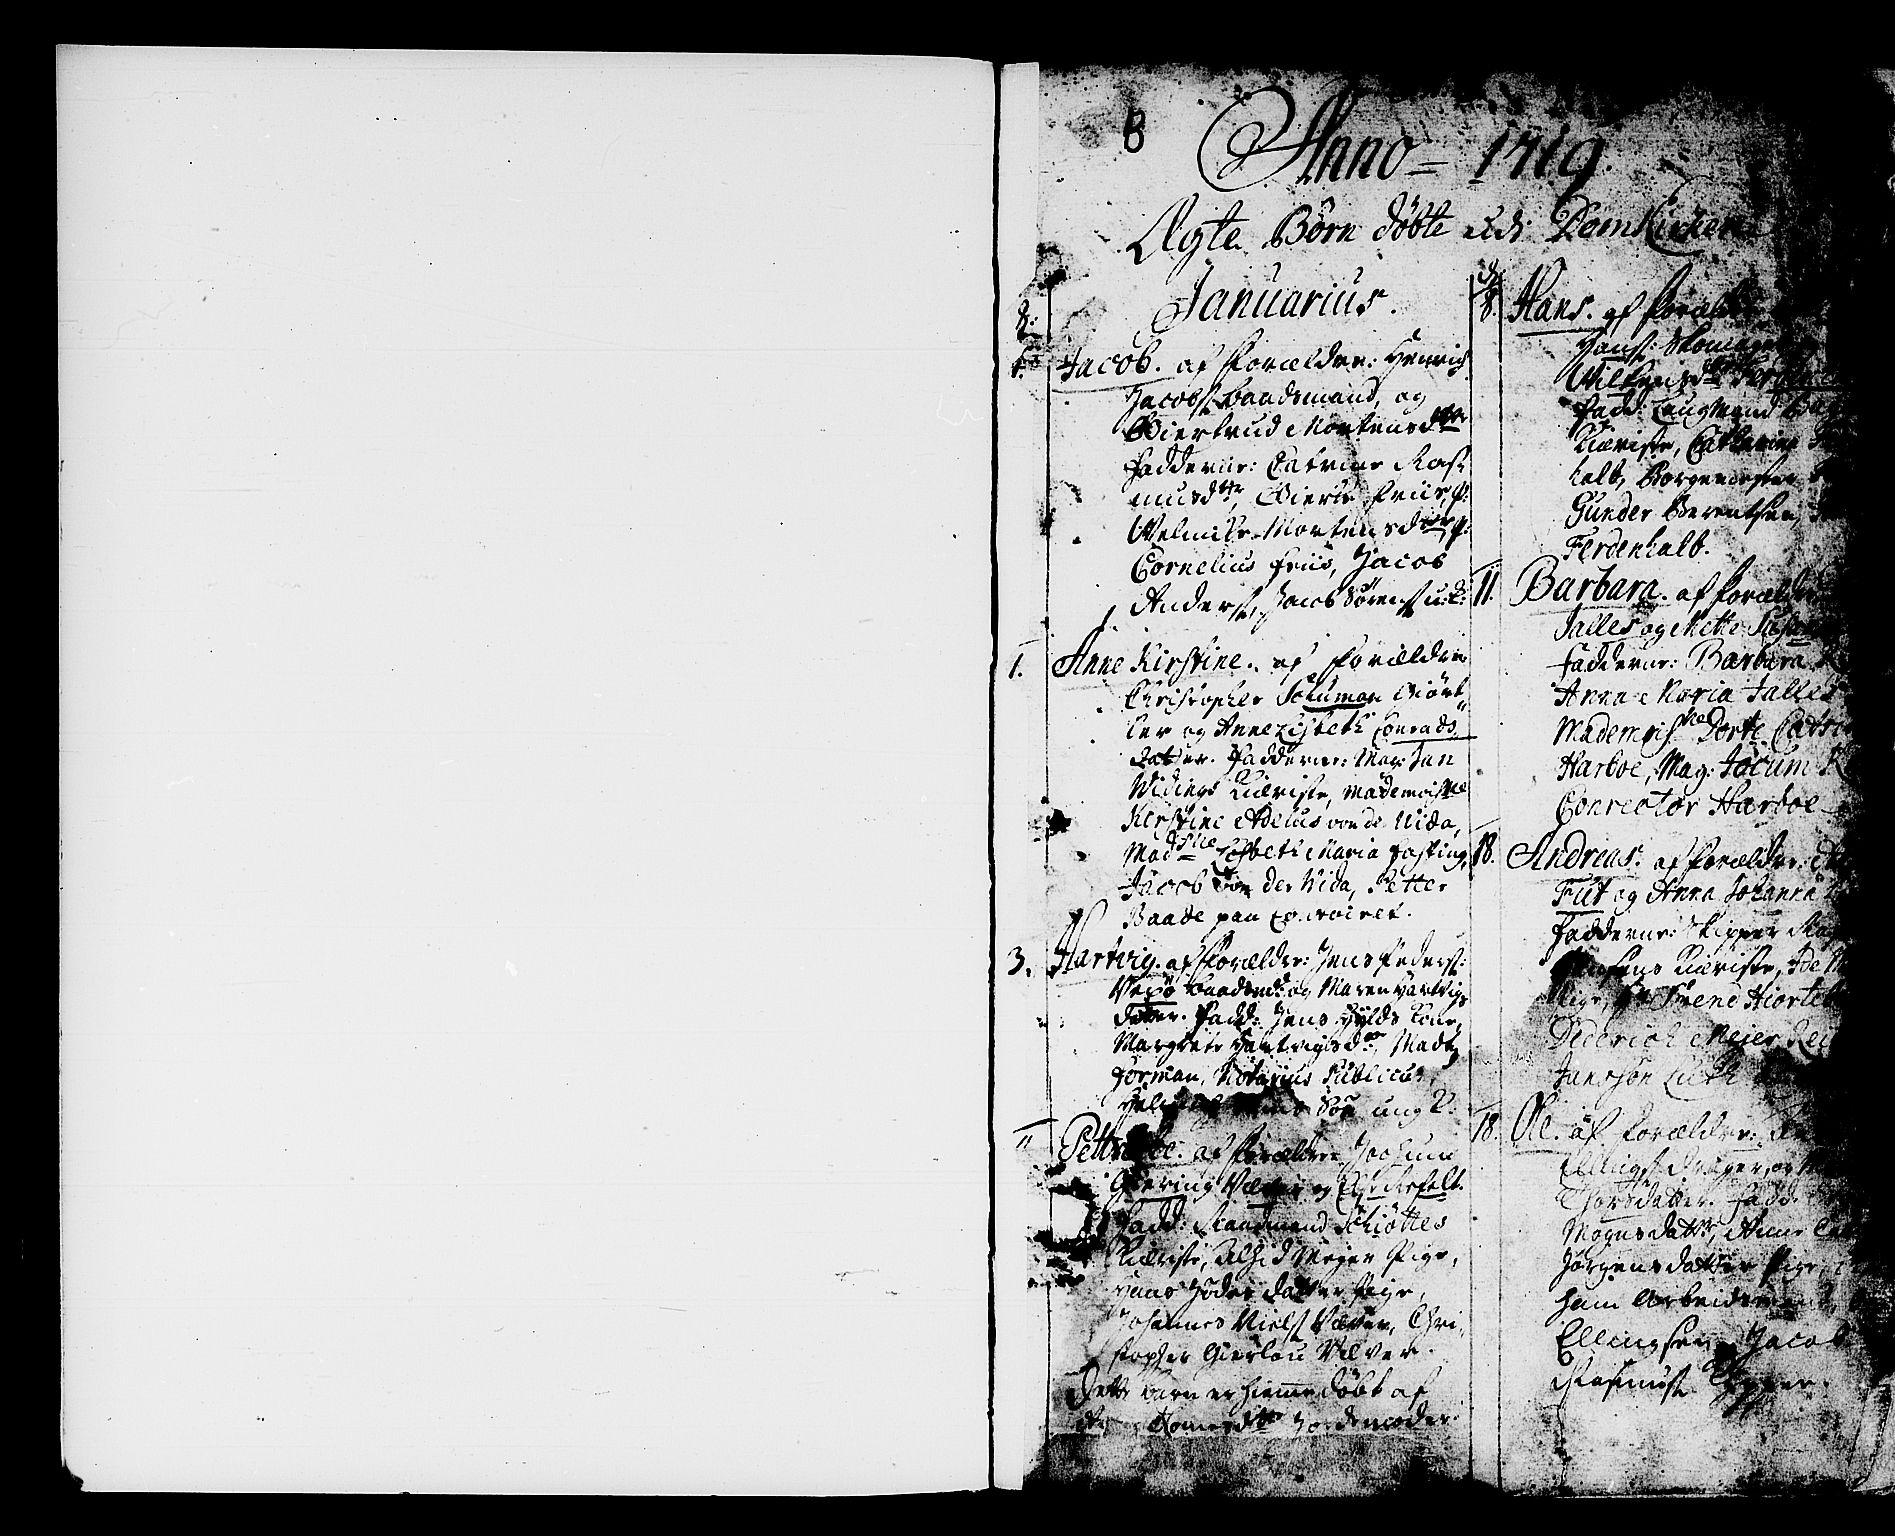 SAB, Domkirken Sokneprestembete, H/Haa/L0001: Ministerialbok nr. A 1, 1719-1732, s. 0-1